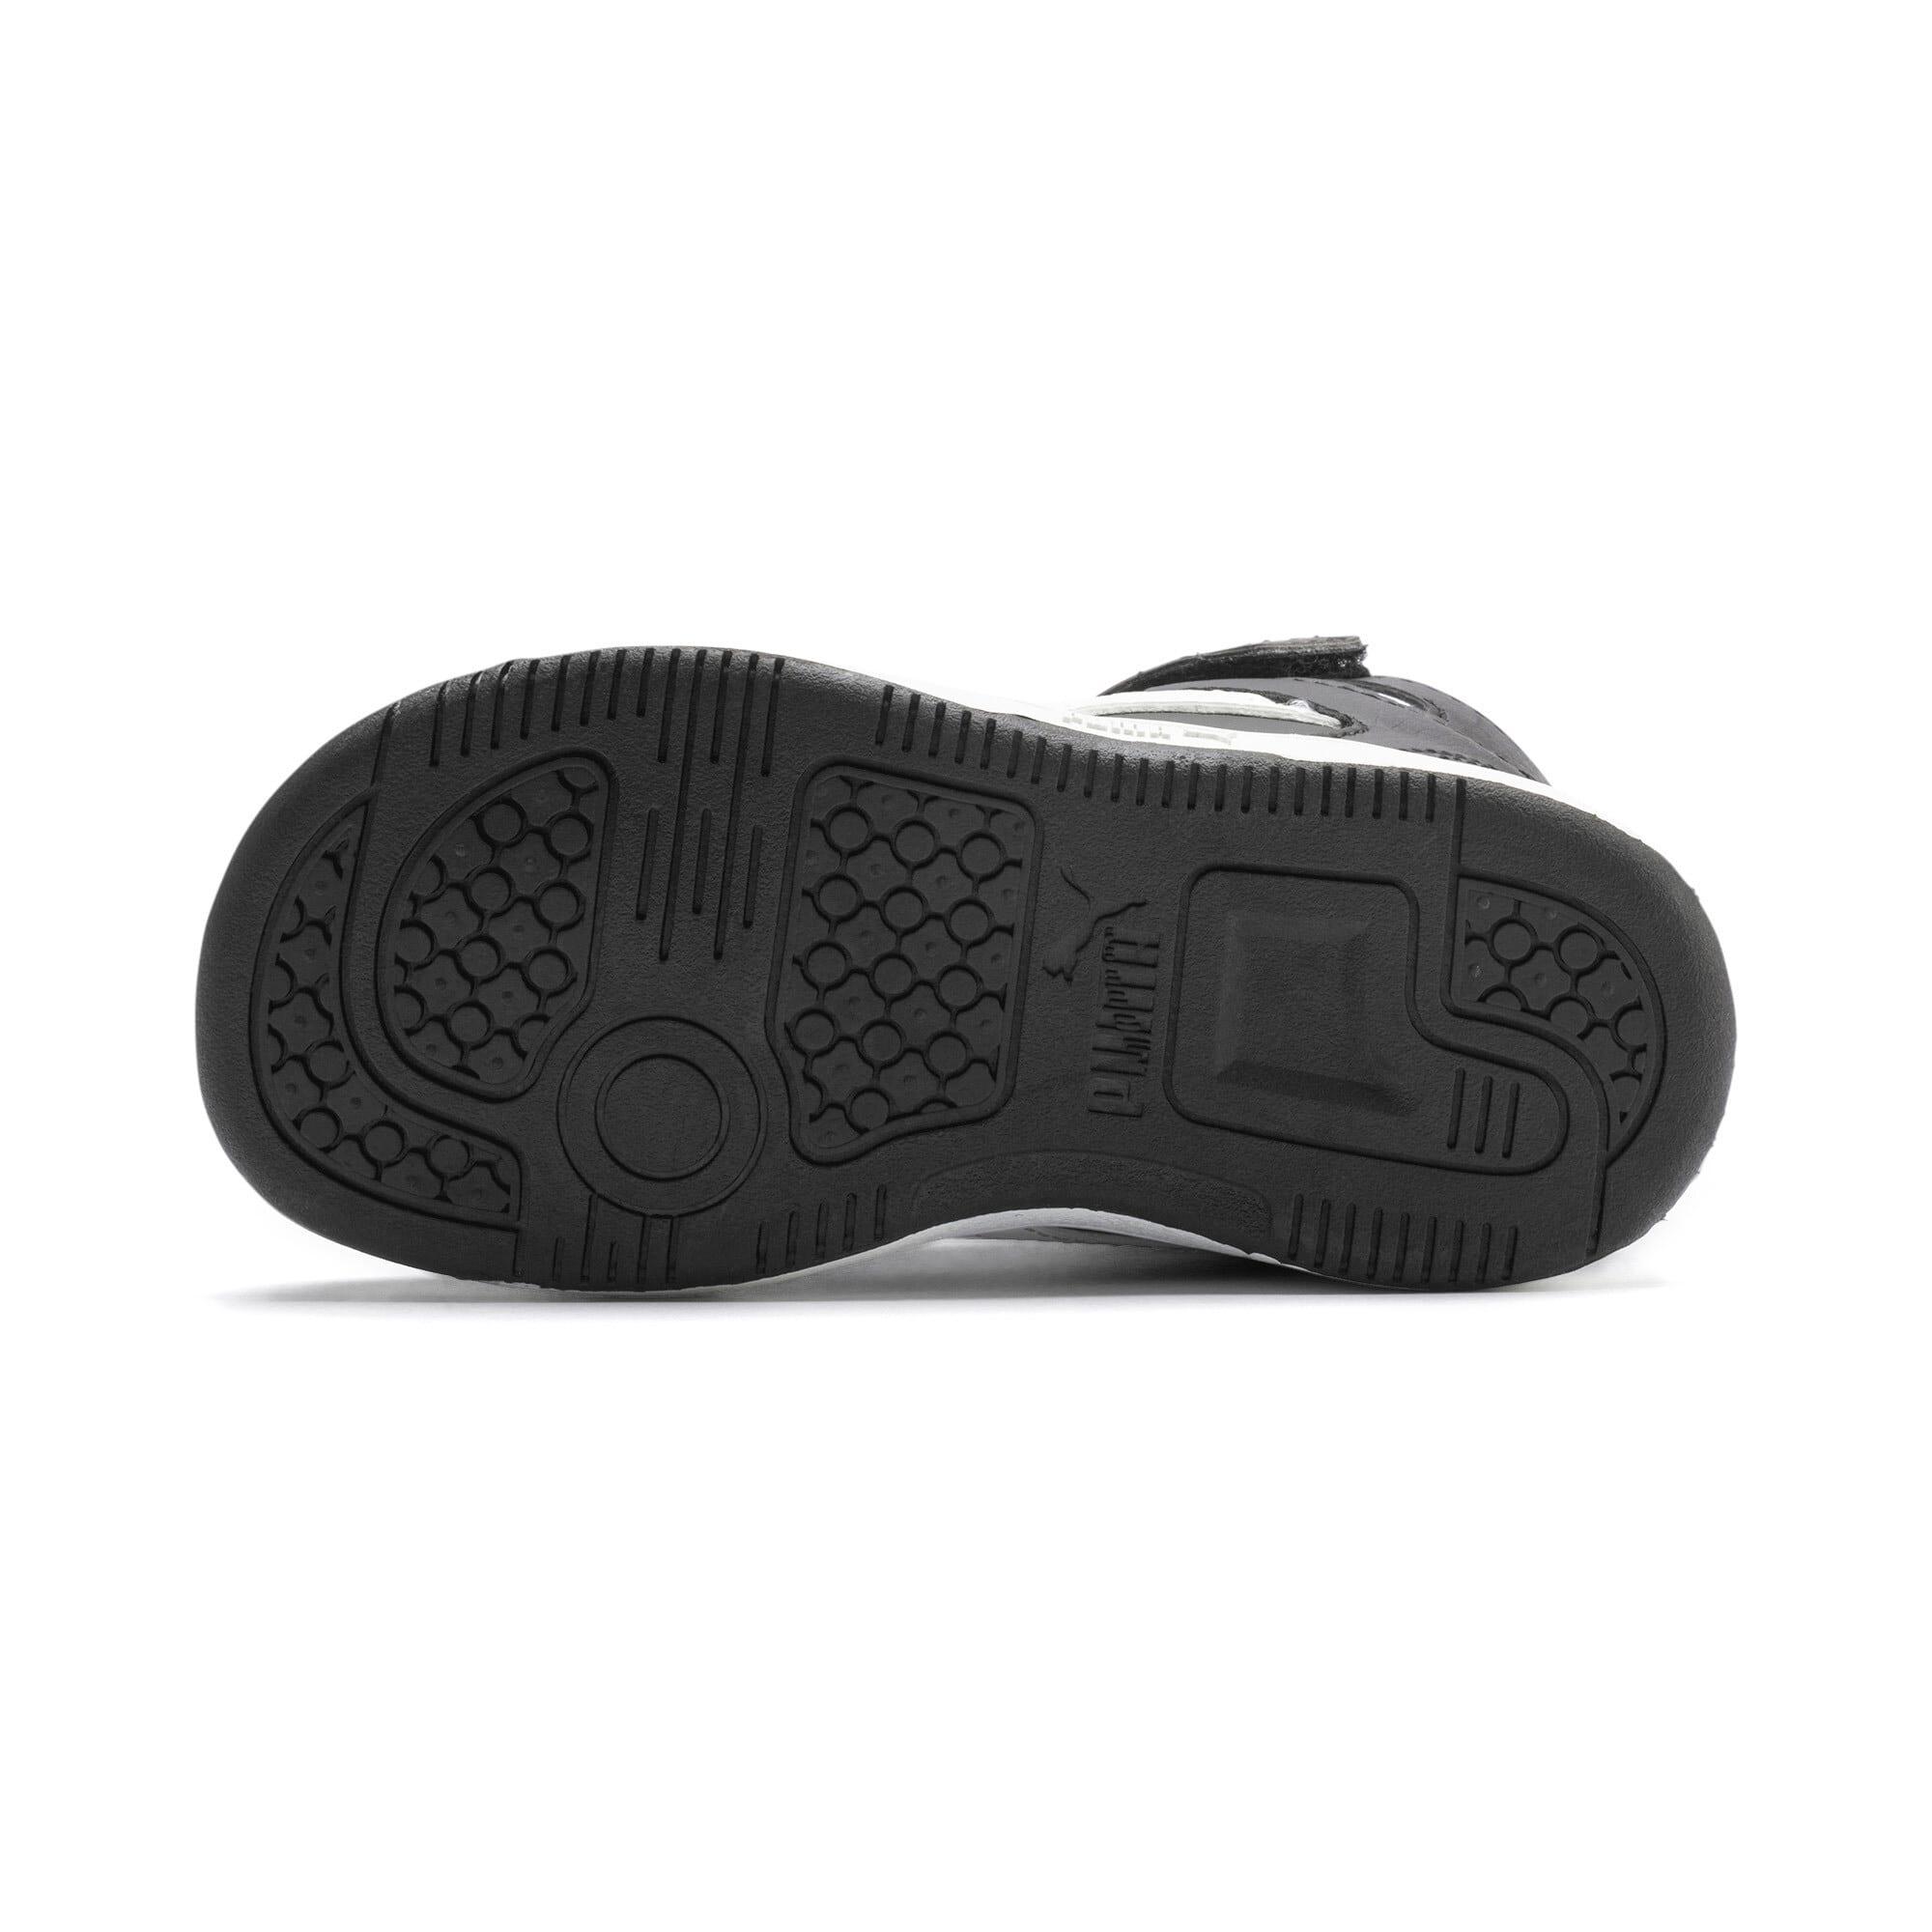 Thumbnail 4 of PUMA Rebound LayUp Toddler Shoes, Puma Black-Puma White, medium